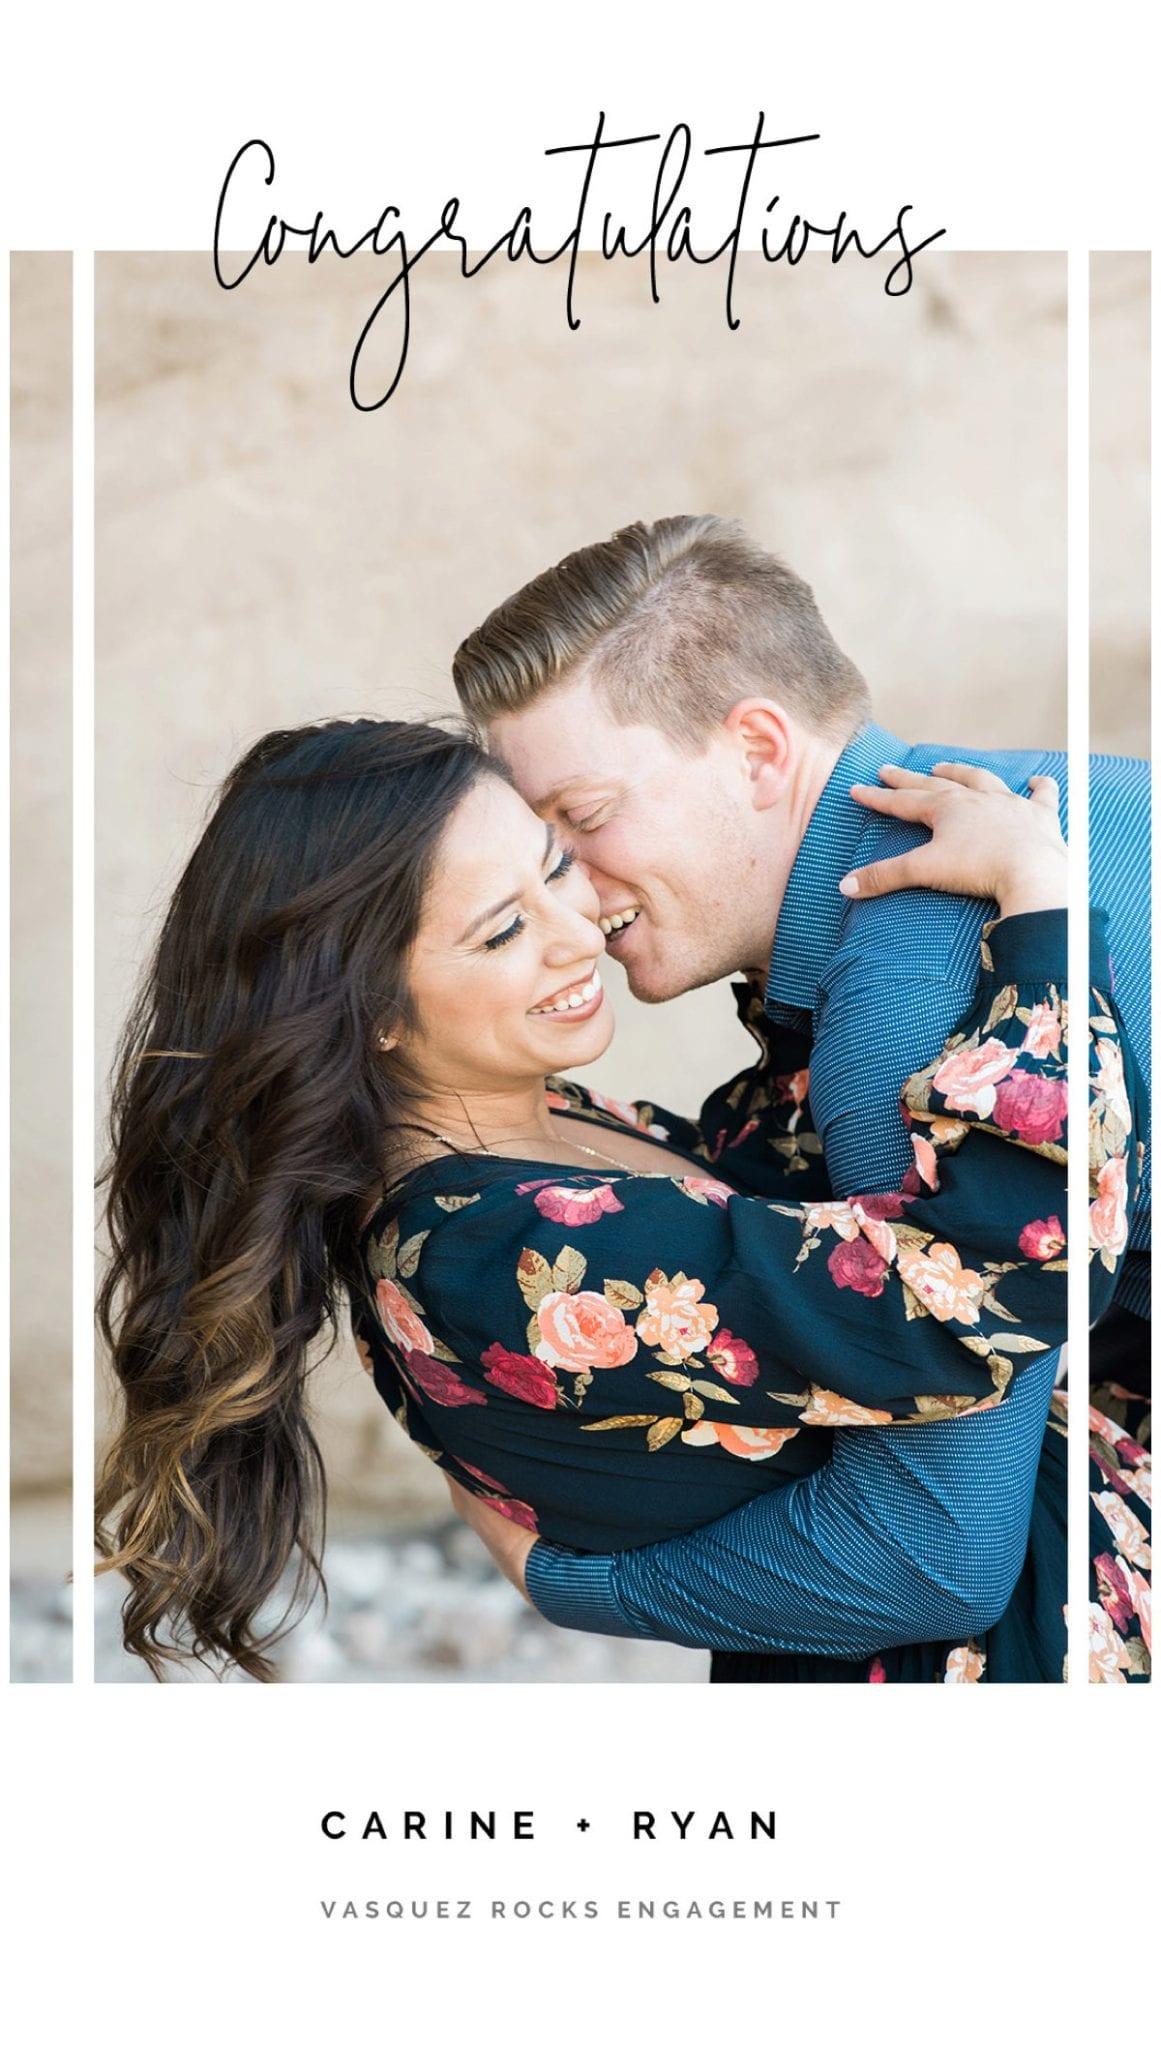 Vasquez-Rocks-Engagement-Carine-Ryan-Carissa-Woo-Photography_0005.jpg